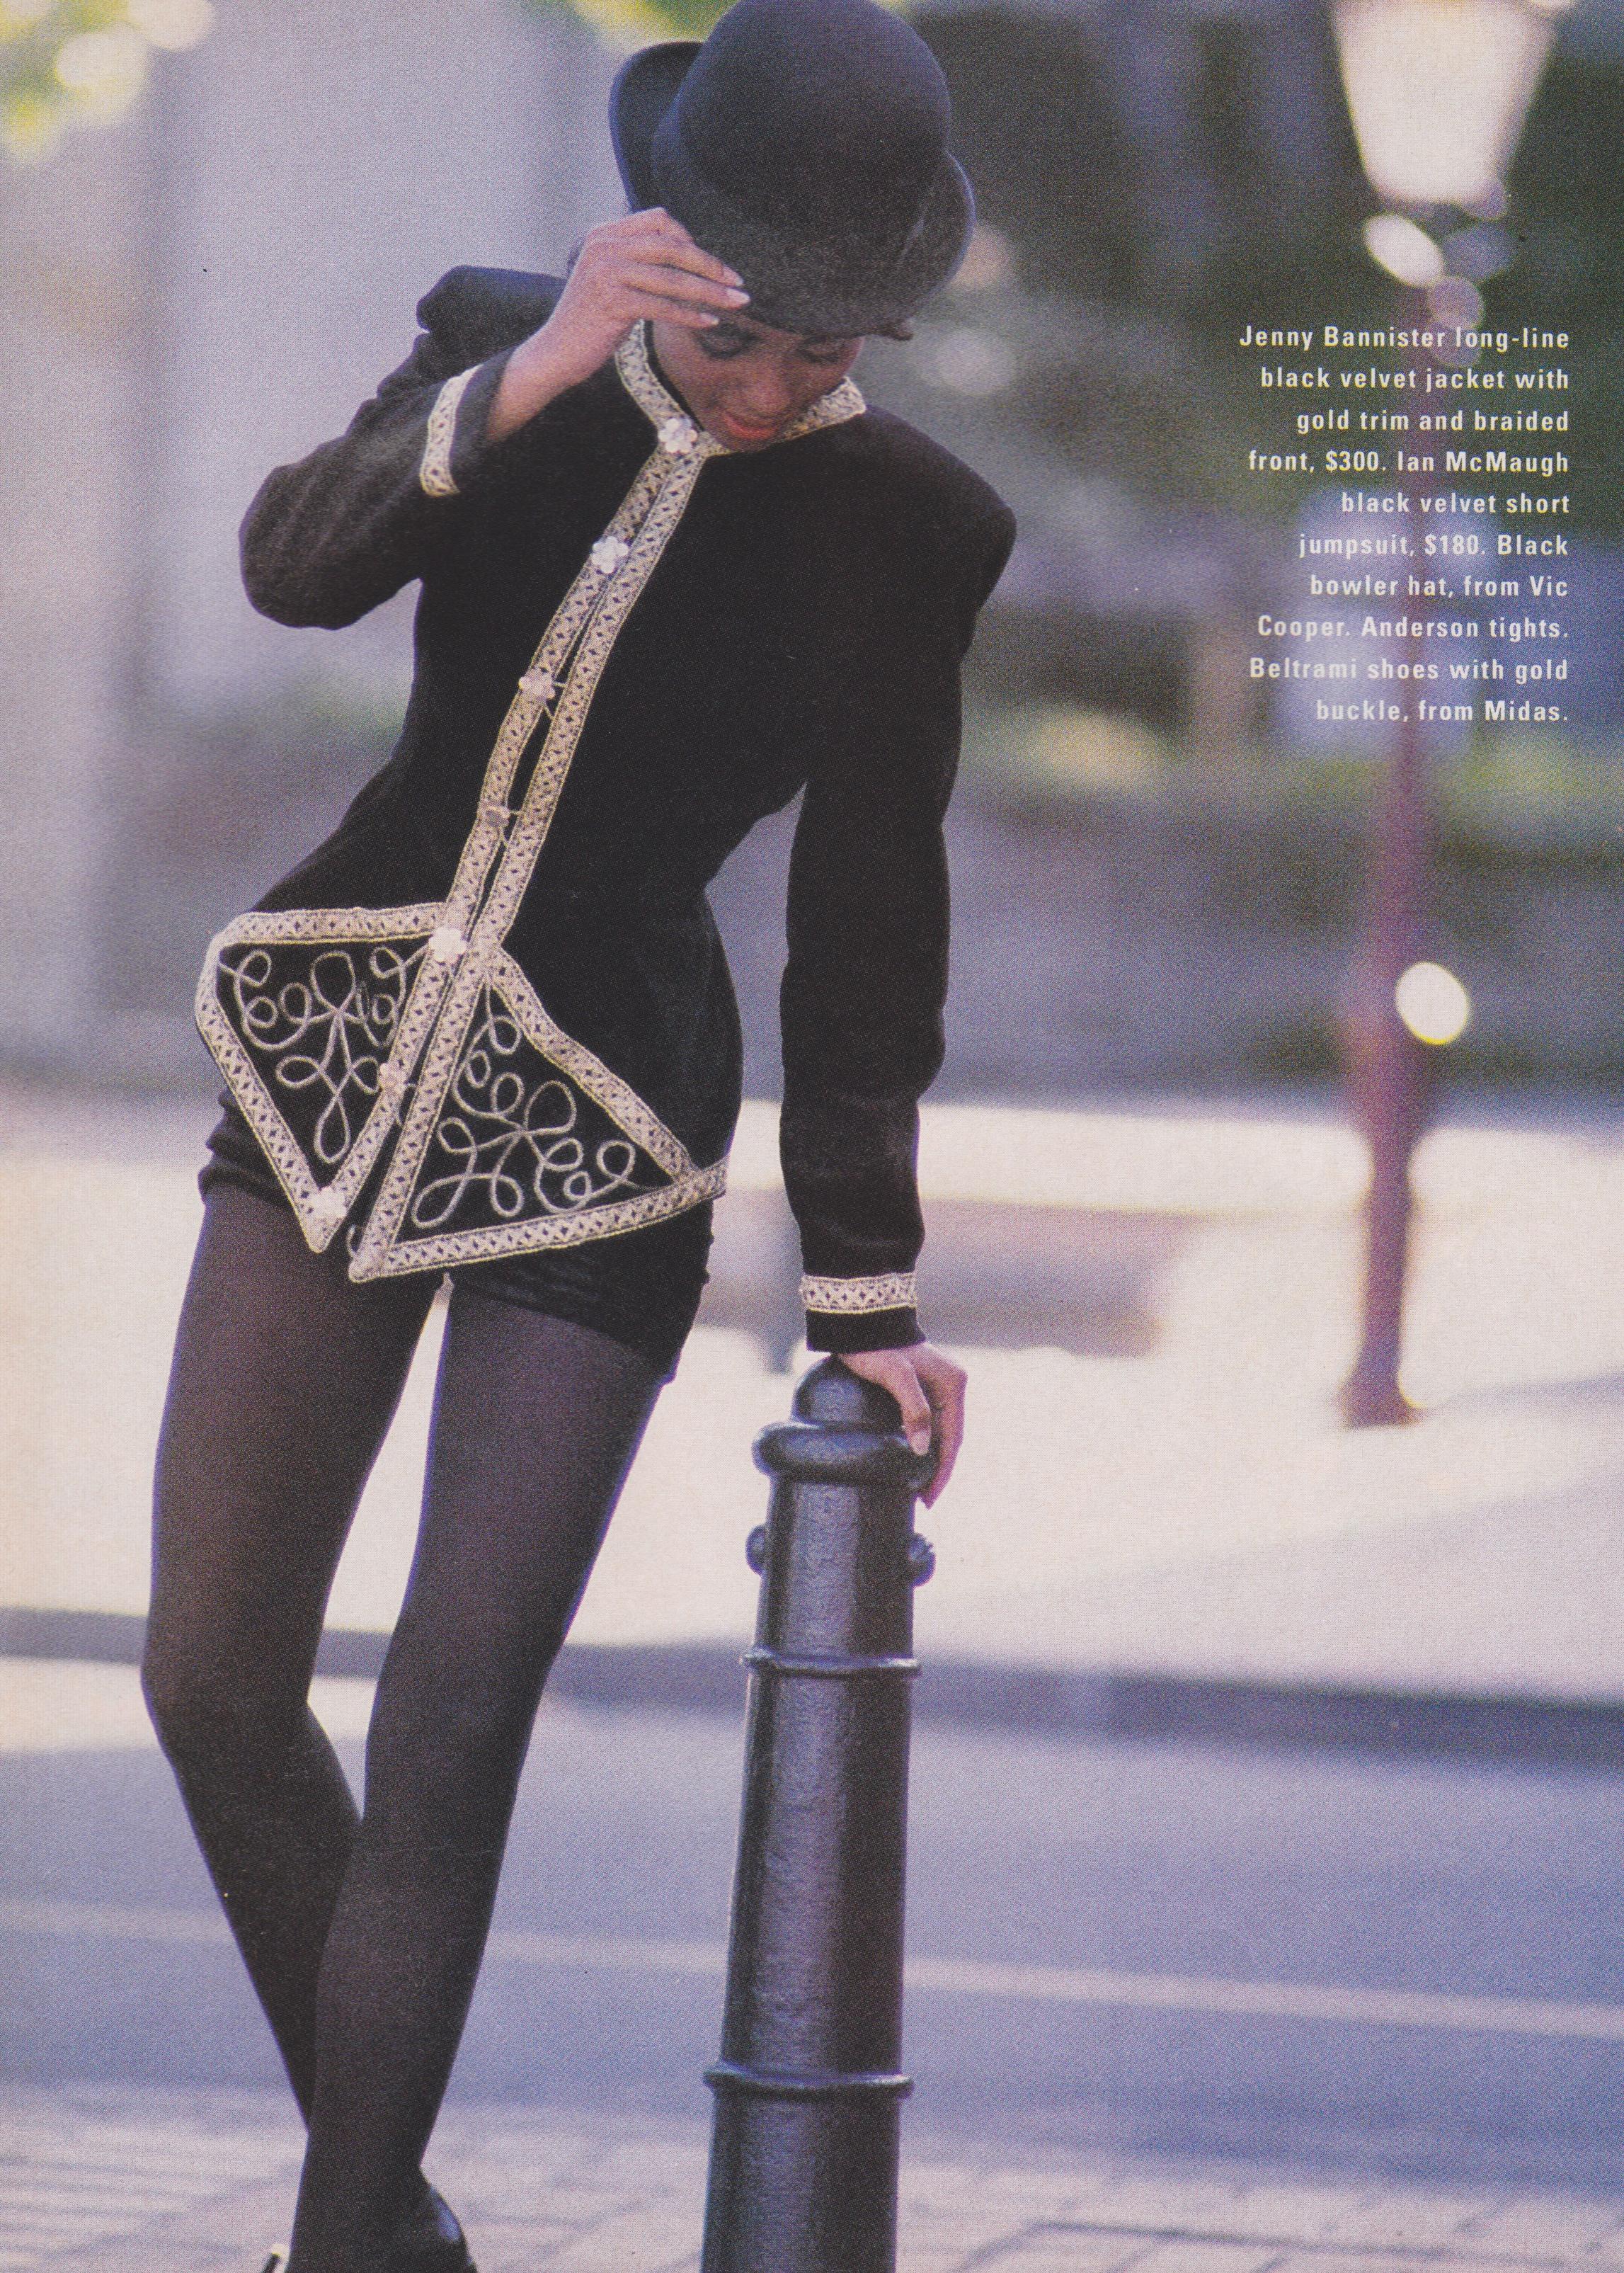 Cosmo June 1990 | International Style 19.jpeg